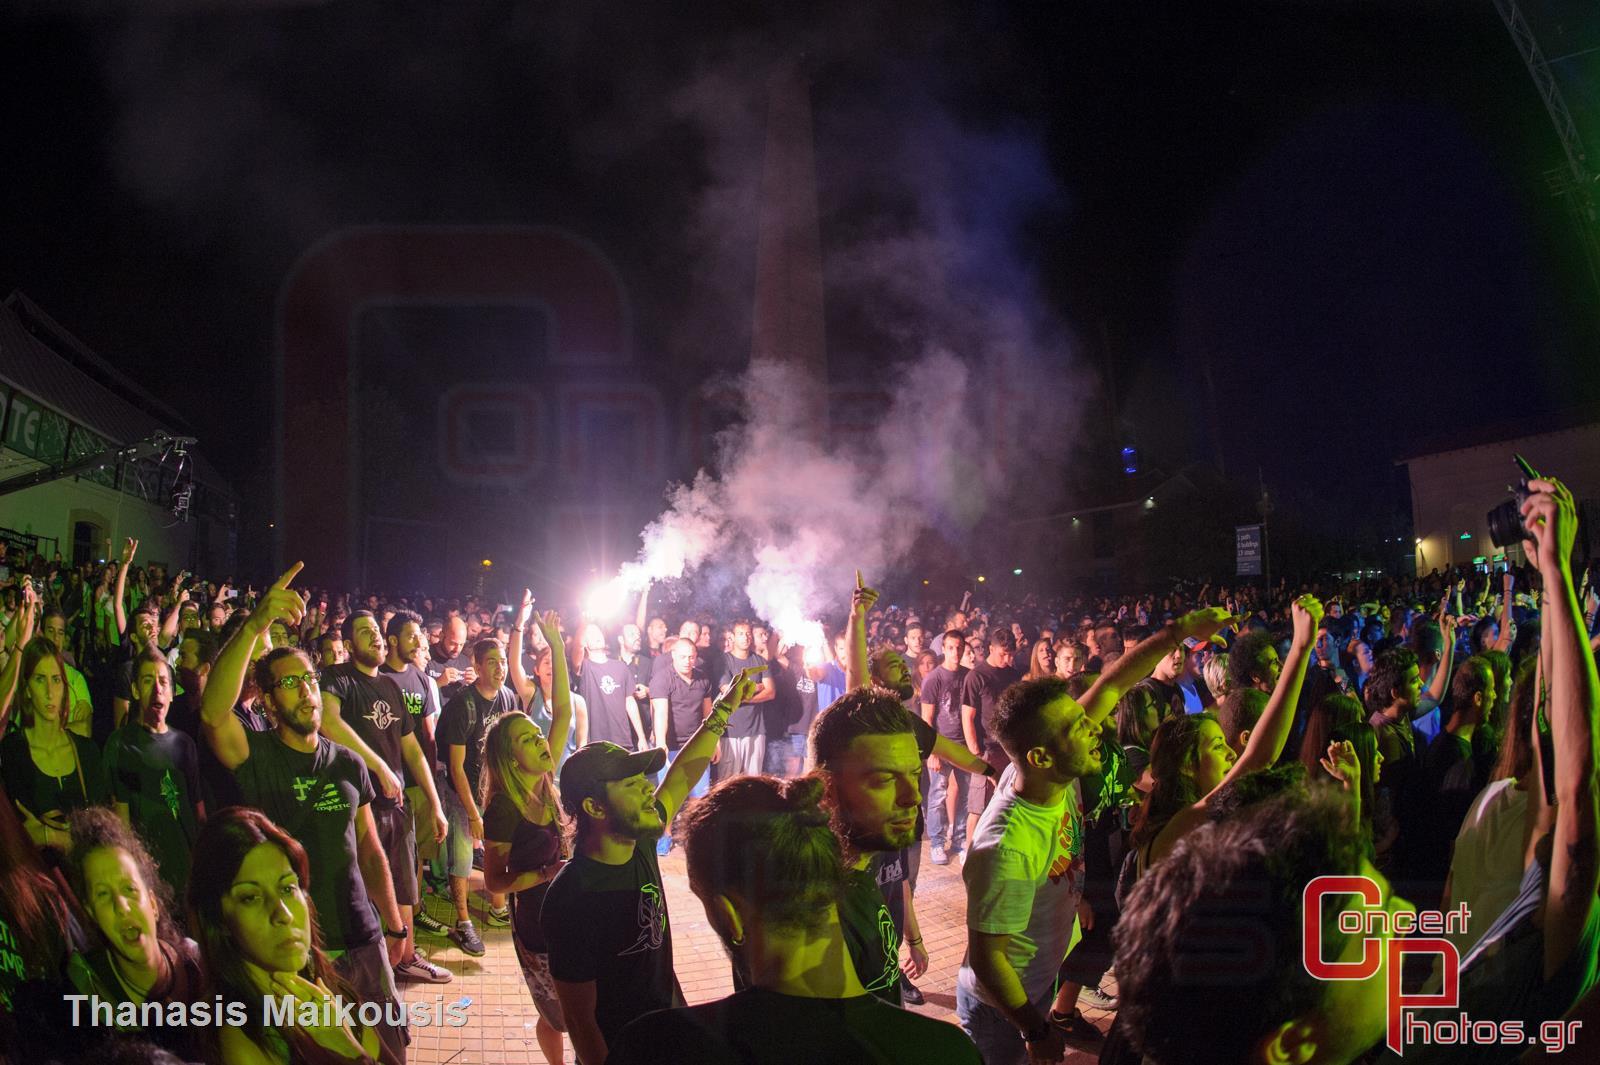 Active Member - Τραγούδα μας να φύγει το σκοτάδι- photographer: Thanasis Maikousis - concertphotos_-5250